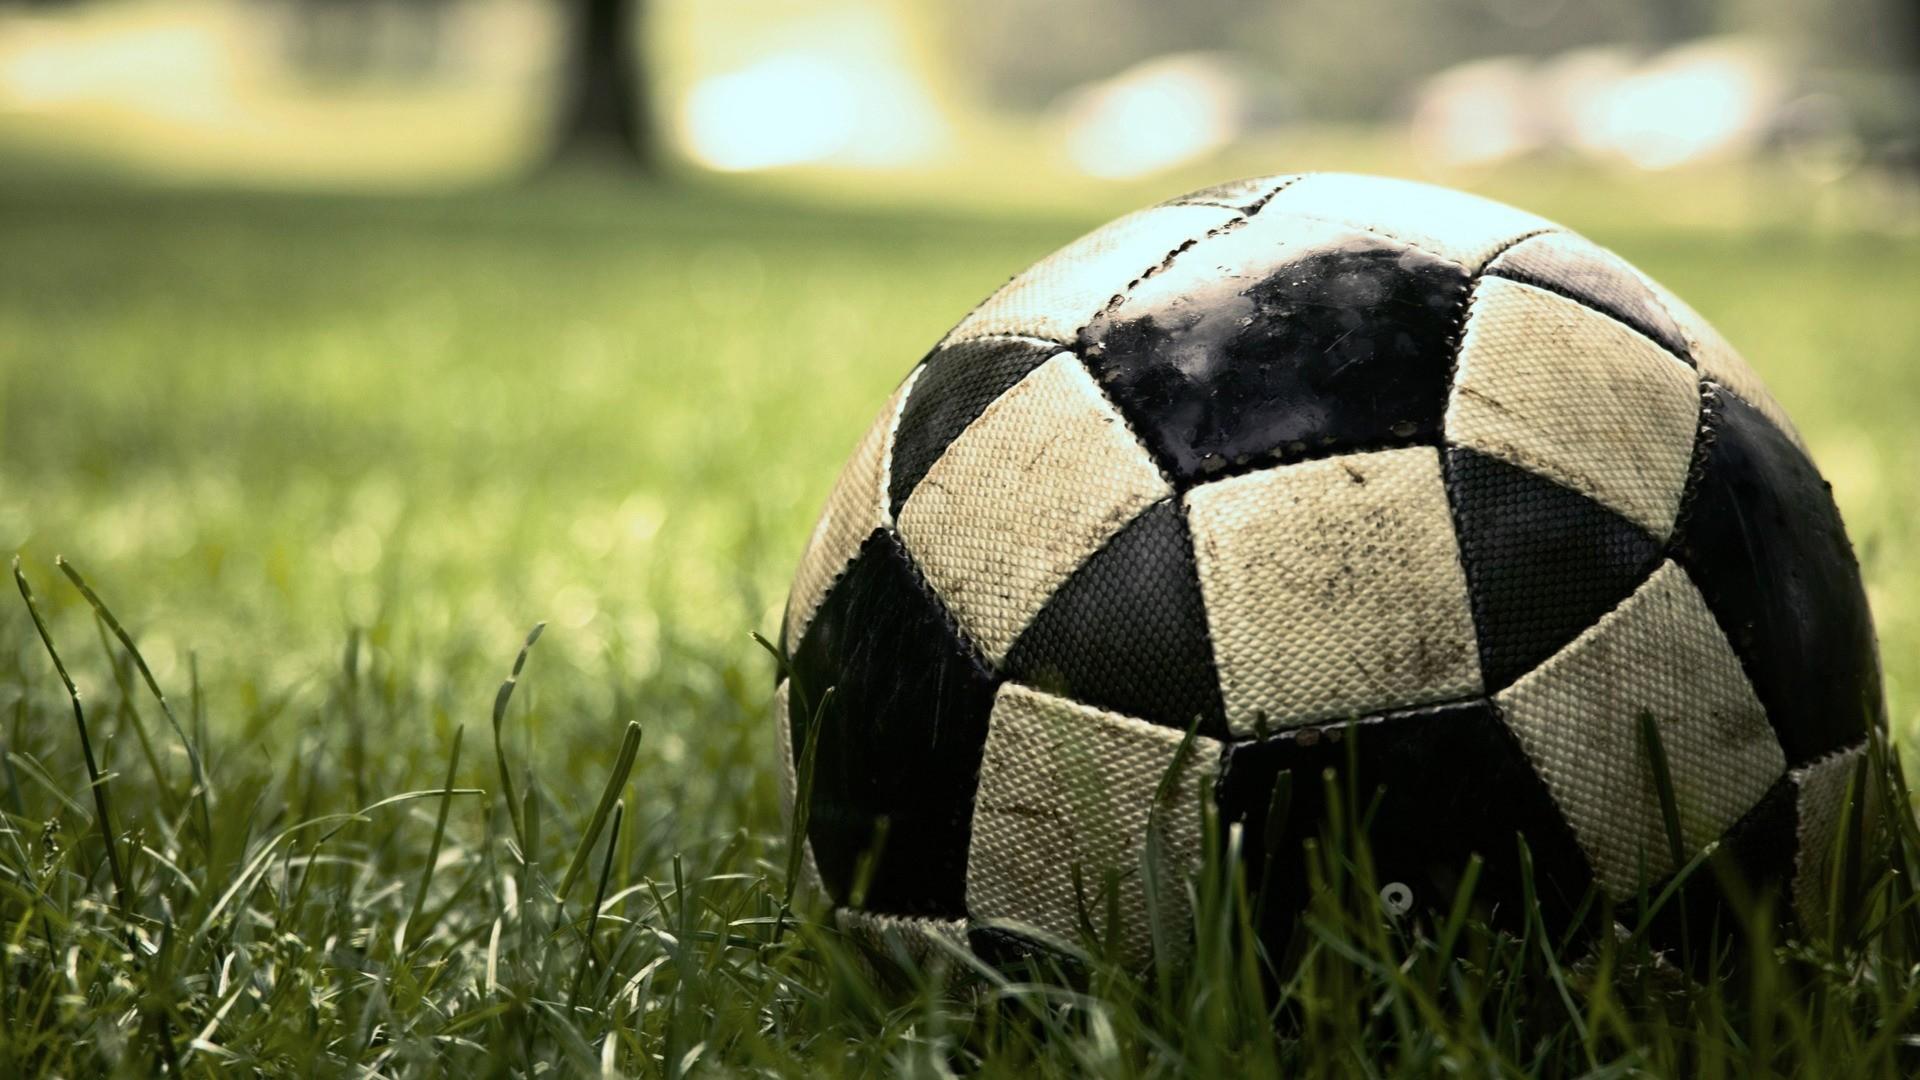 Dirty Soccer Ball 1080p HD Wallpaper Sports | HD Wallpapers Source